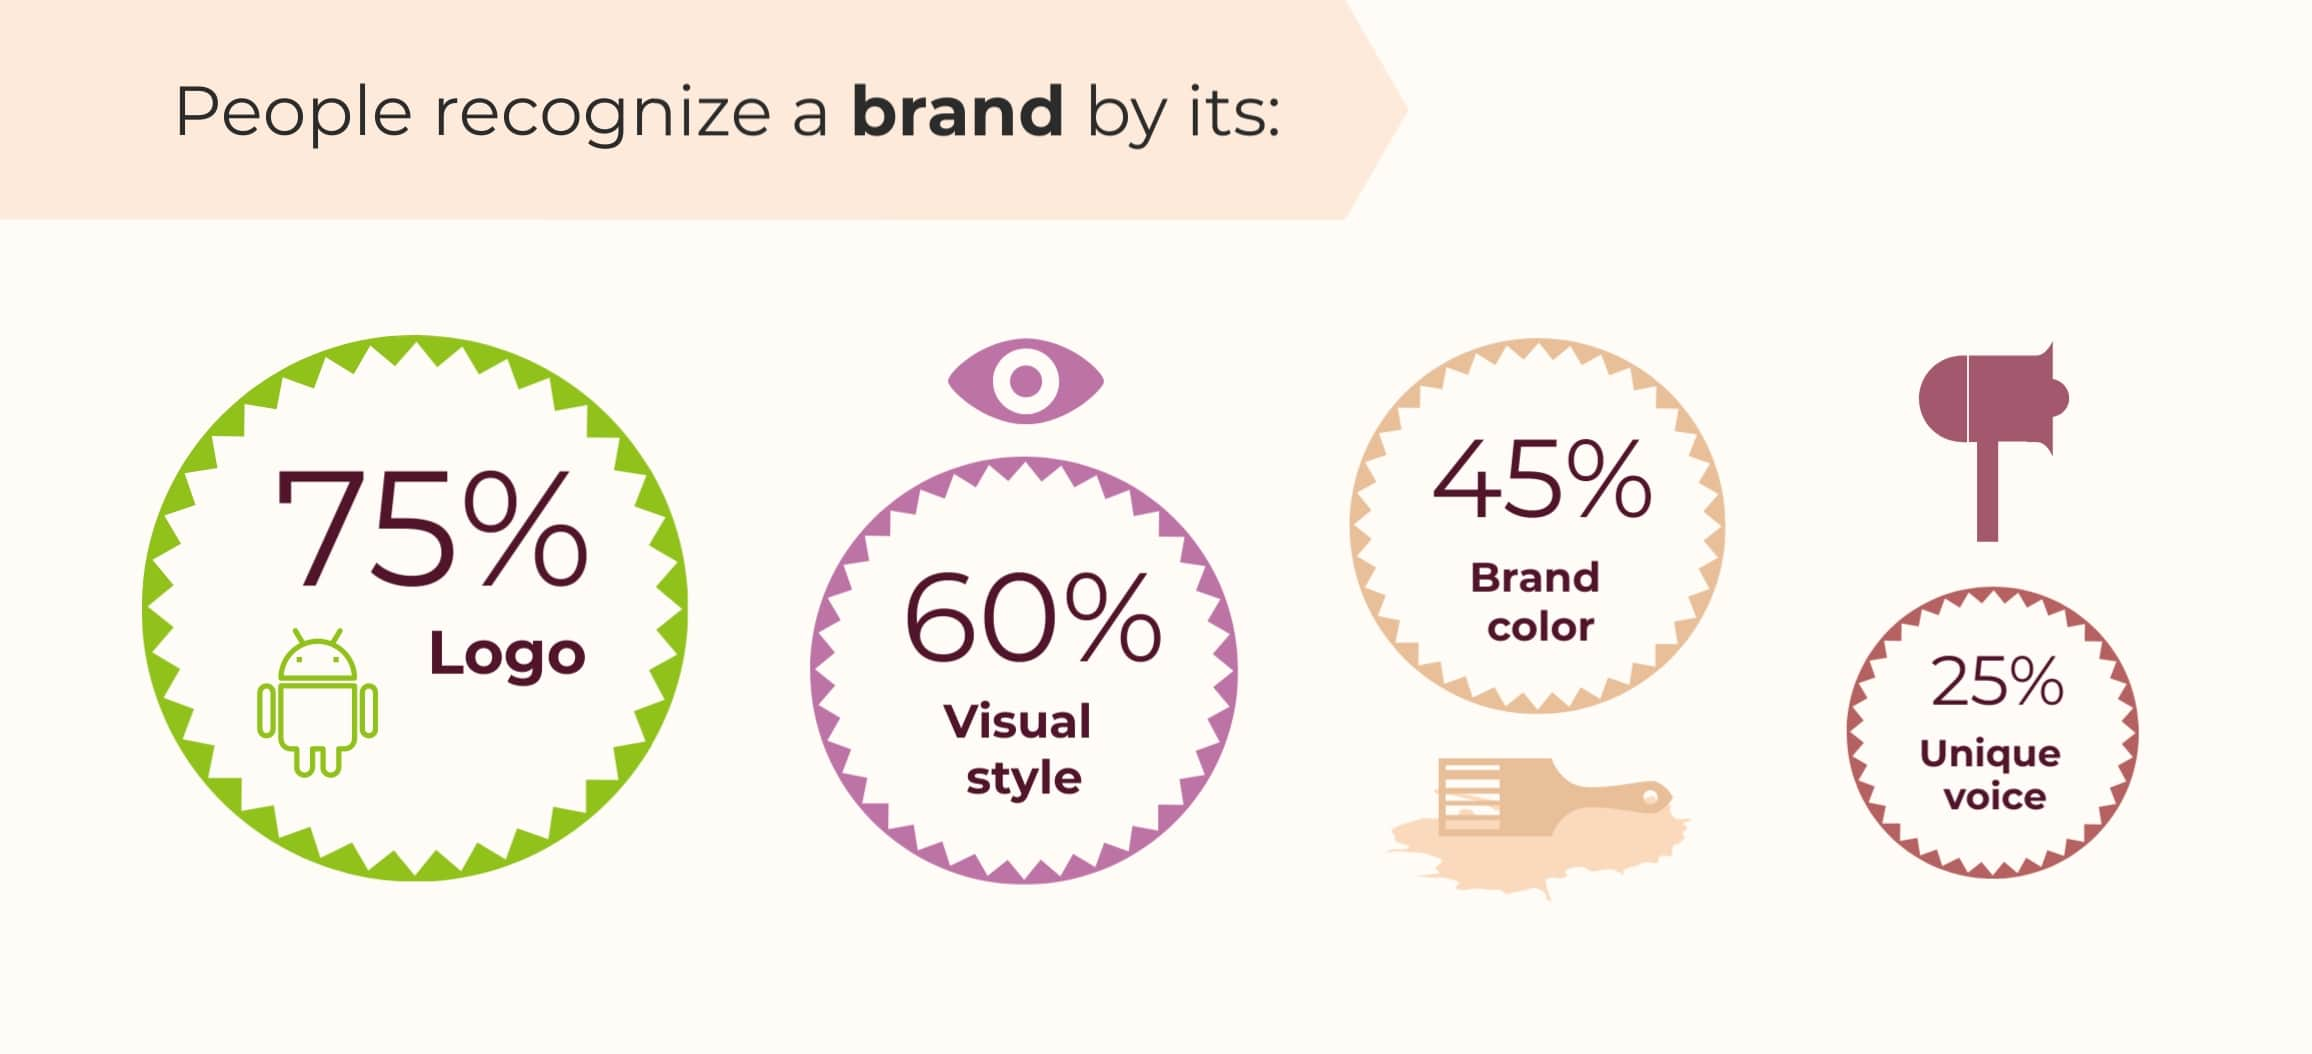 brand recognition statistics 2020